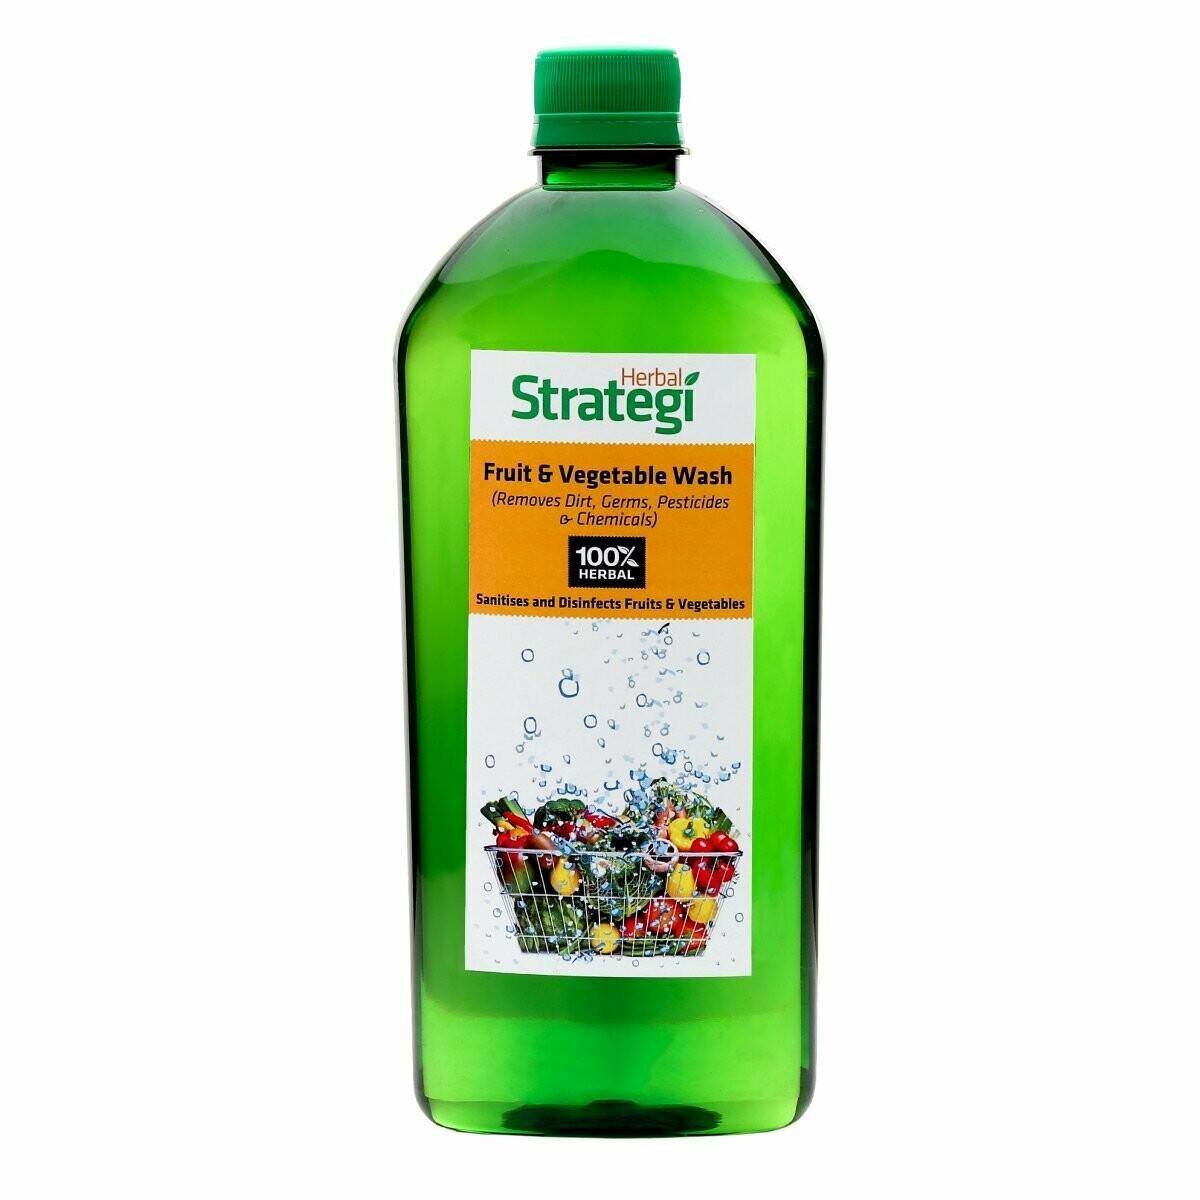 Strategi Herbal Fruit and Vegetable Wash 500ml